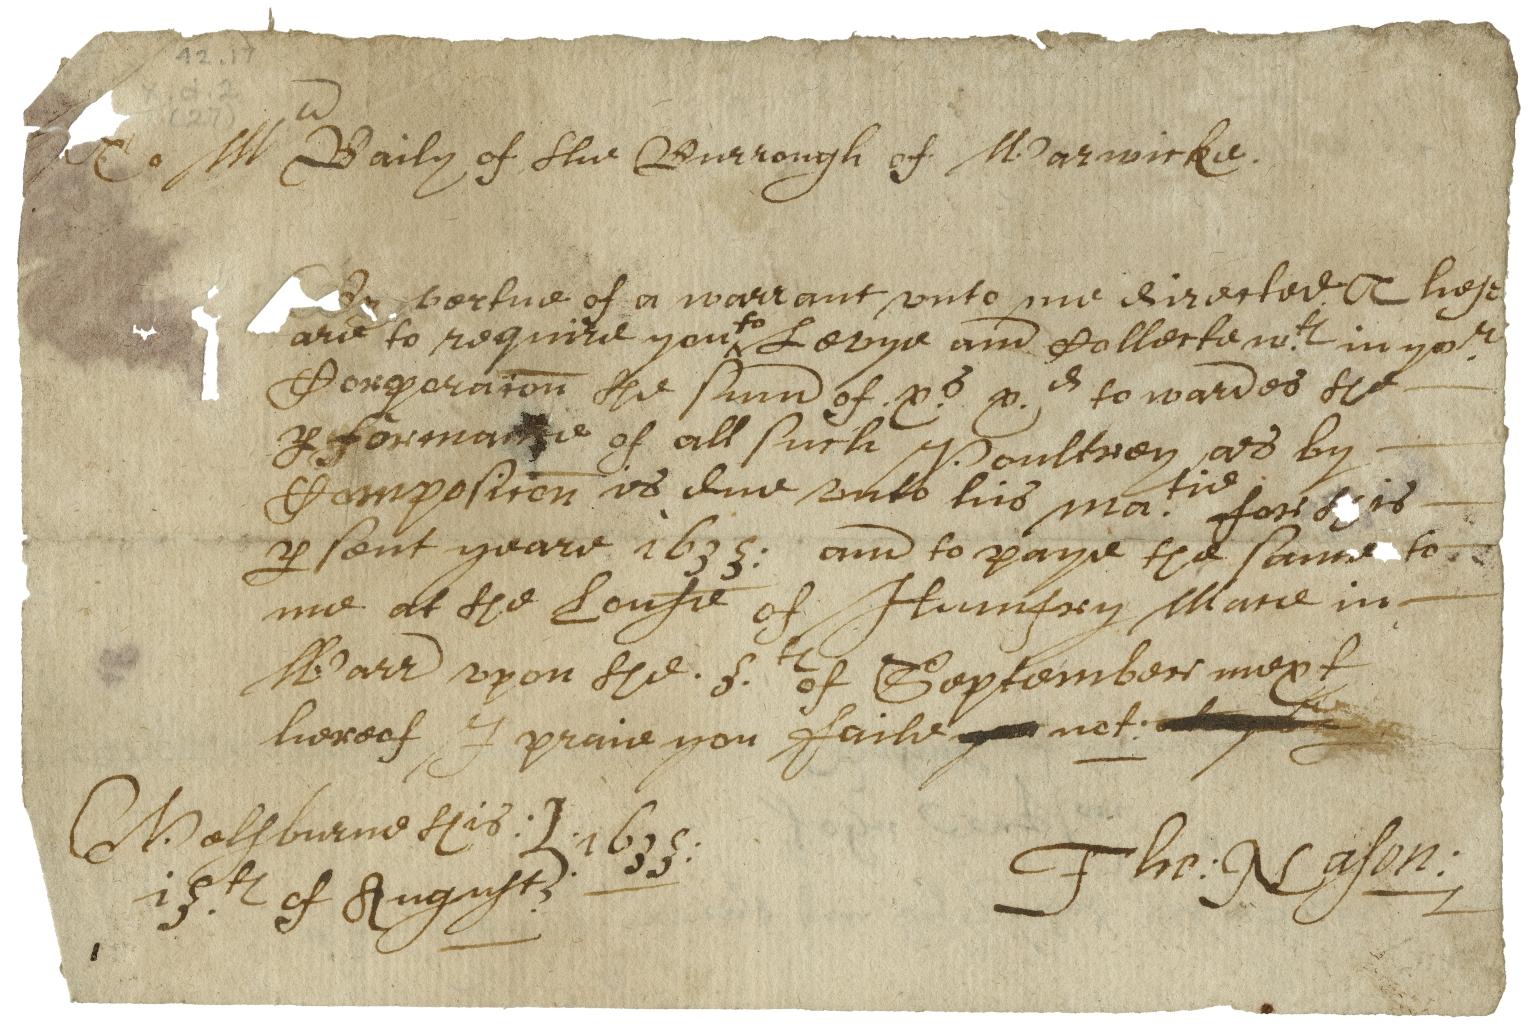 Accounts and bills of Warwick